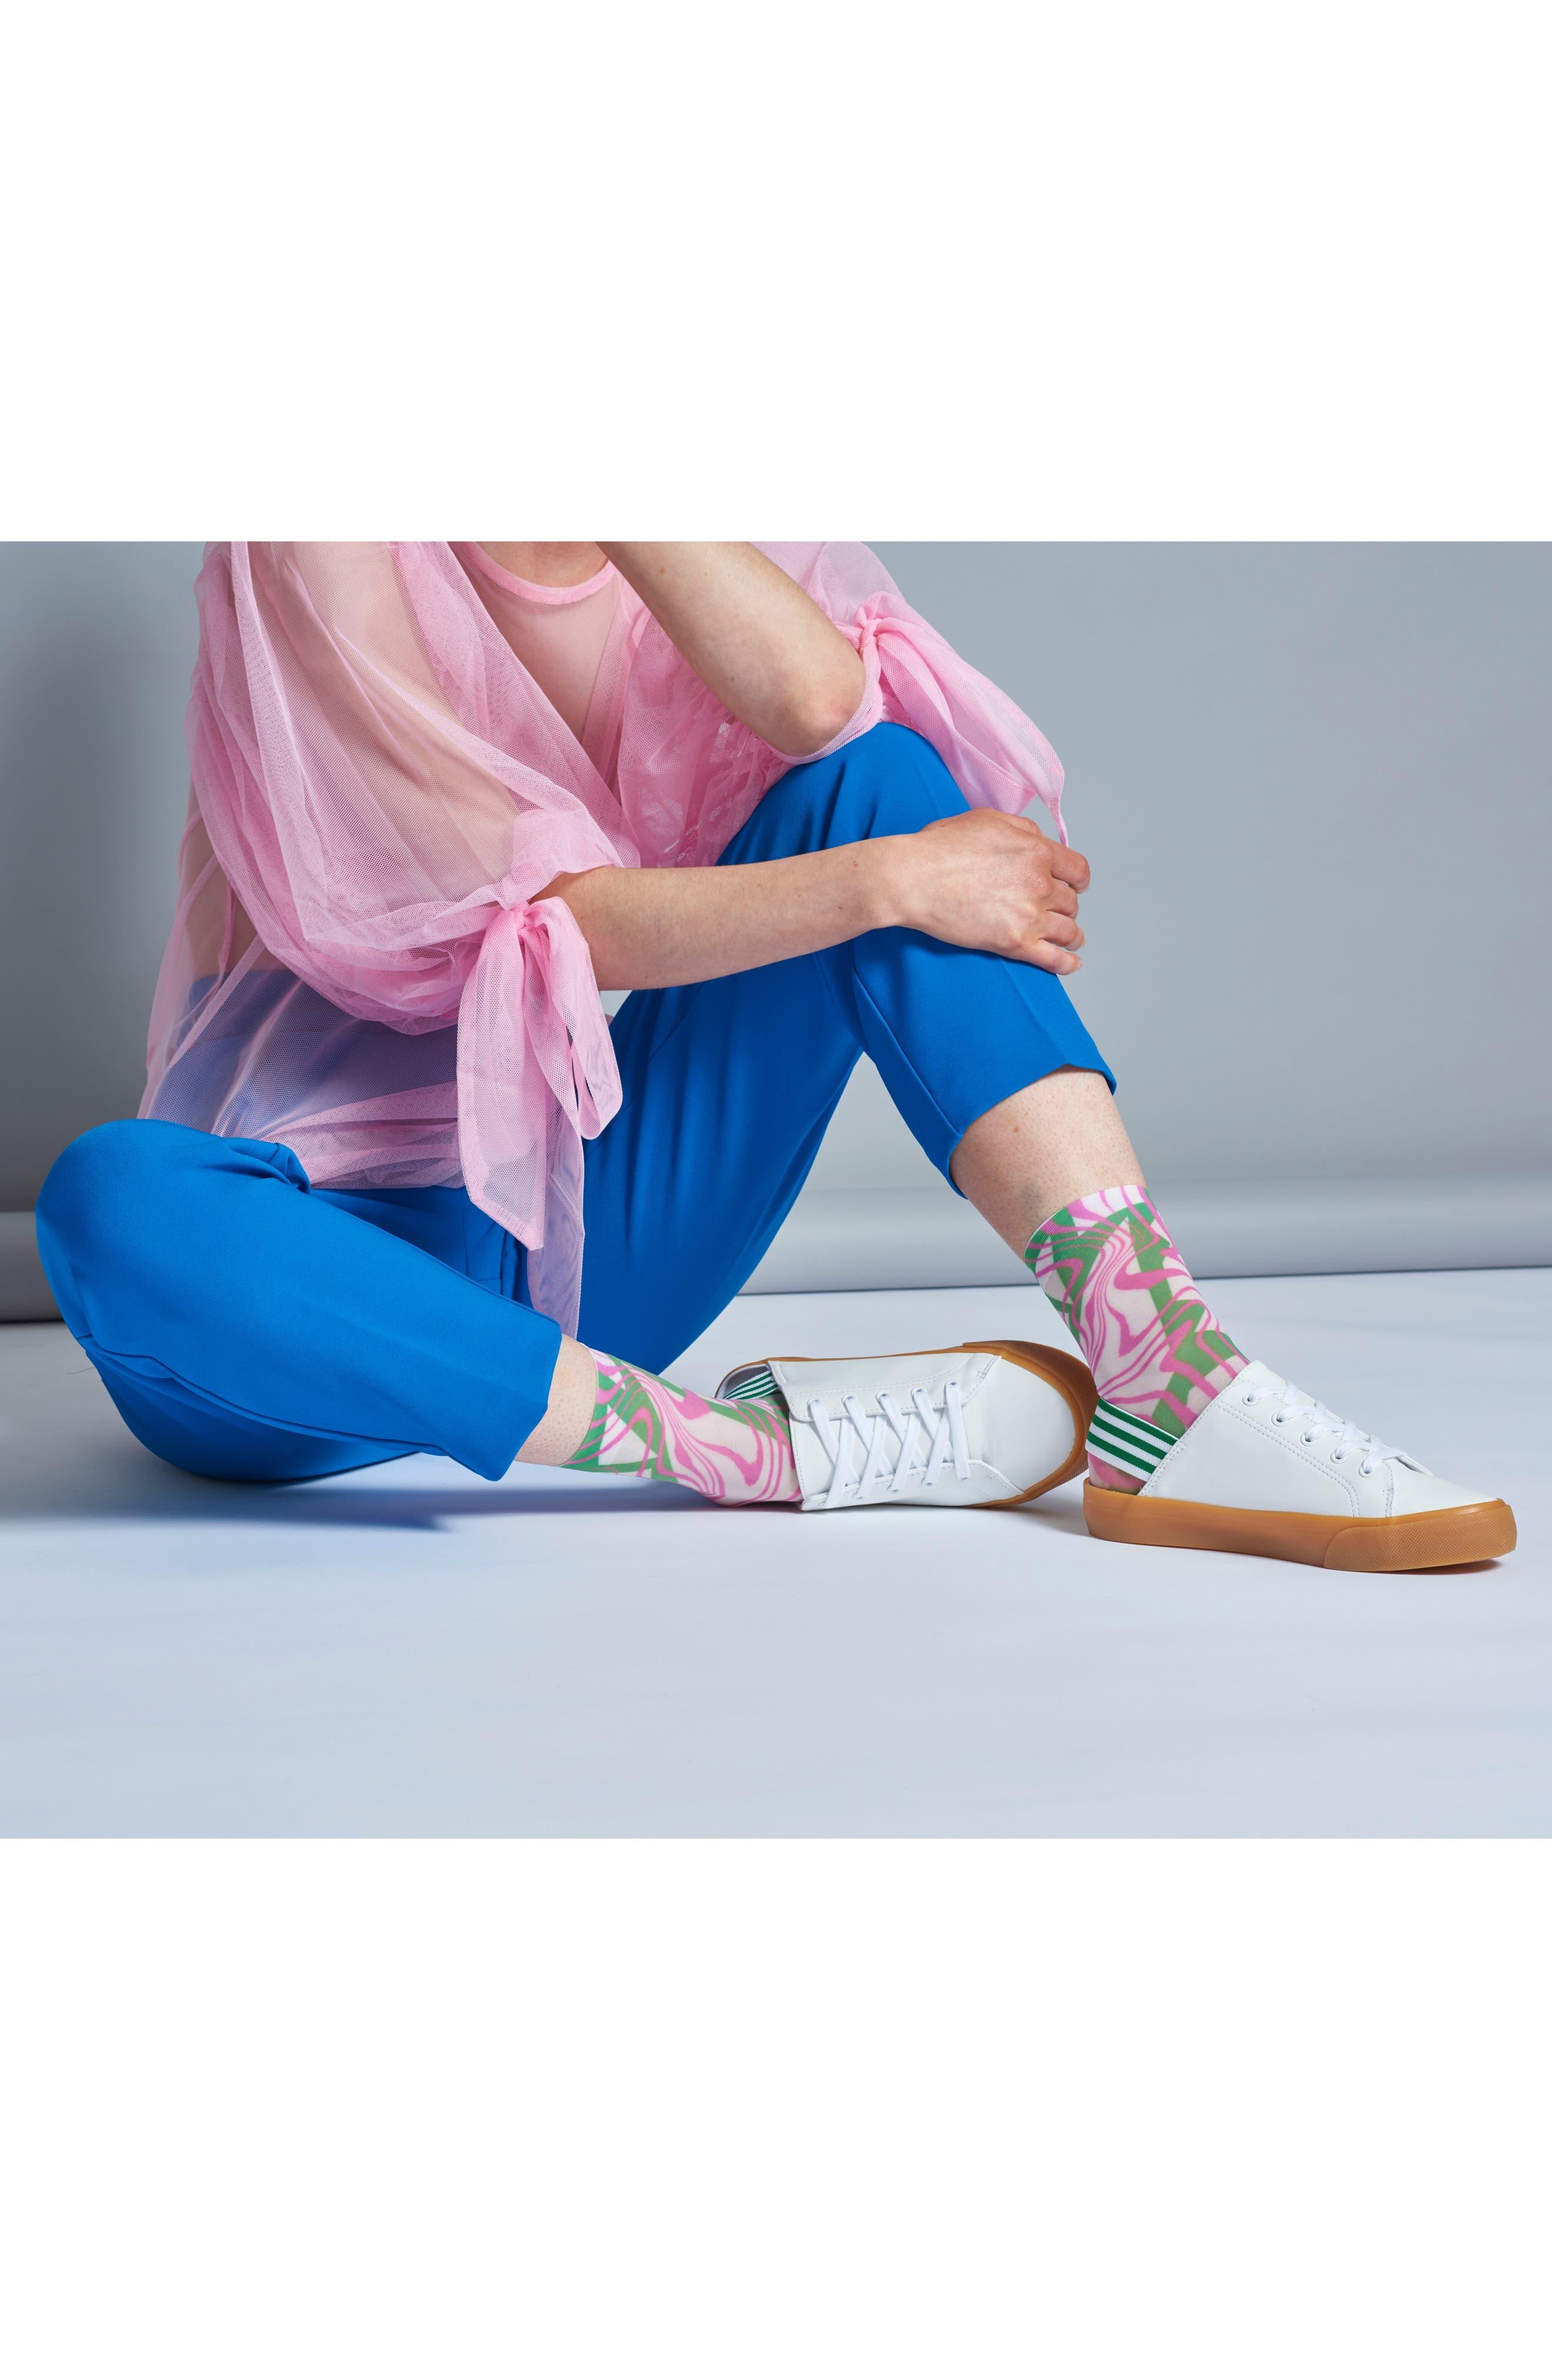 Mia Ankle Socks,                             Alternate thumbnail 3, color,                             685